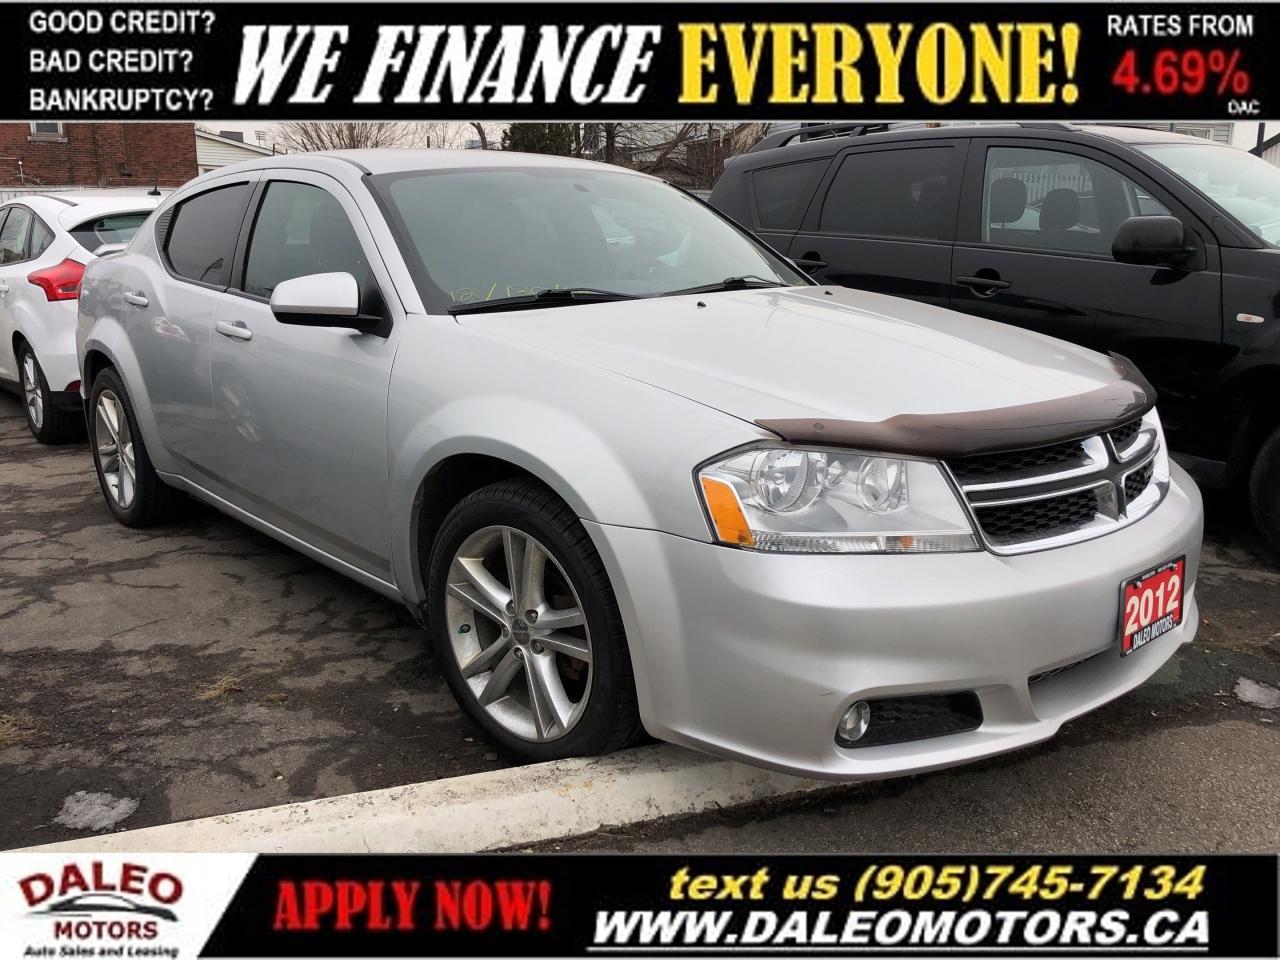 2012 Dodge Avenger SXT | 2.4L 4 CYL | HEATED SEATS | WE FINANCE!